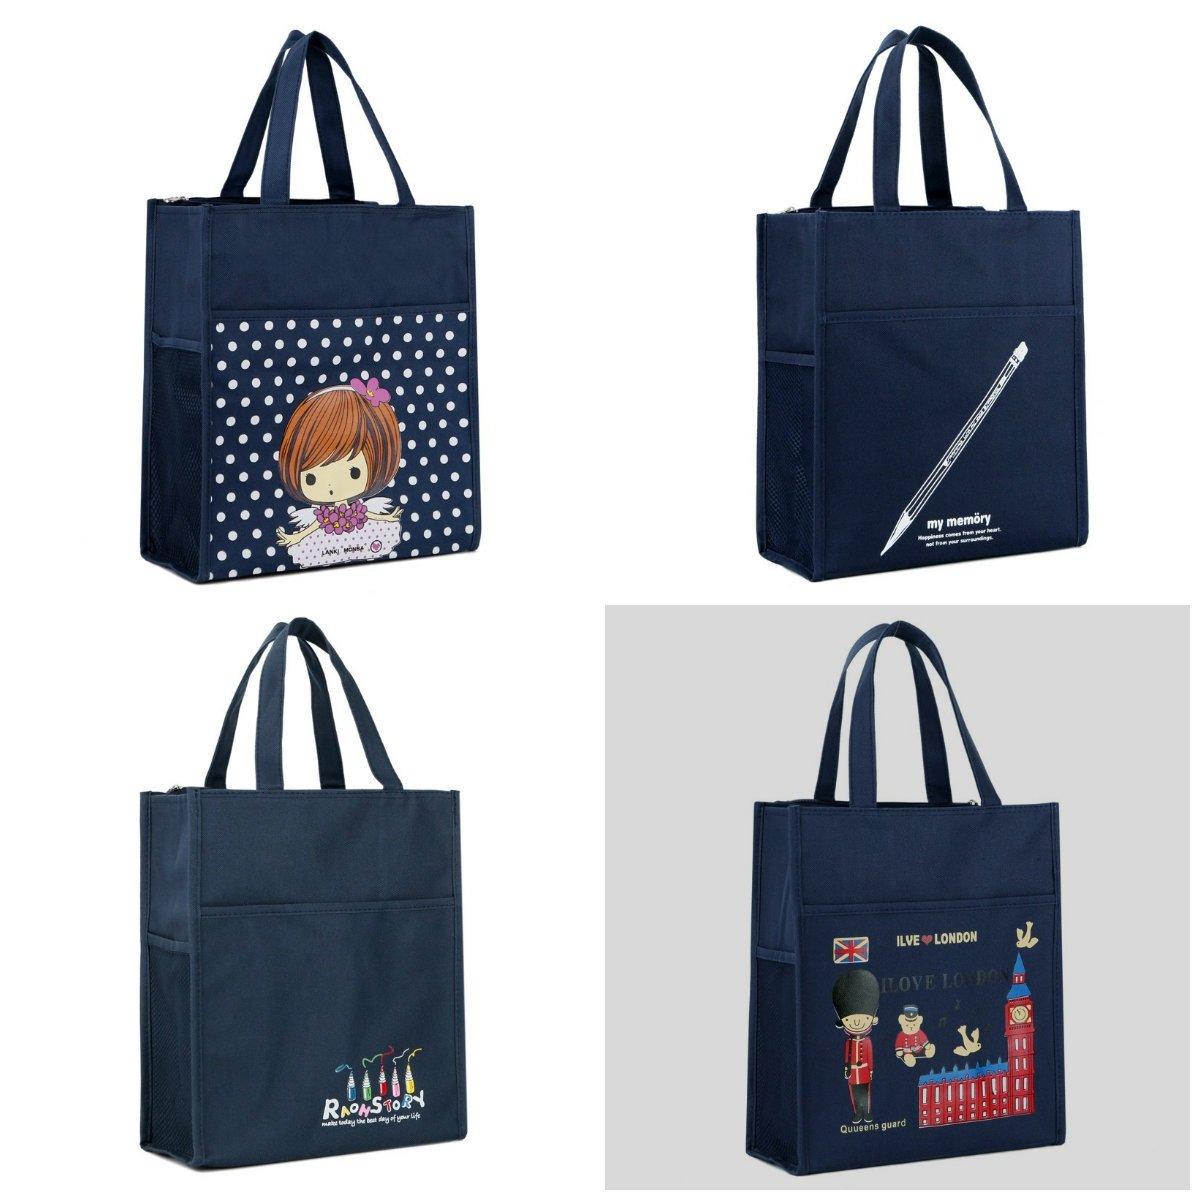 Payonr Womens Stylish Tote Bag Handbag Deep Blue Bear Students Replenishment School Bag Waterproof A4 Book Bag Cartoon File Handbag